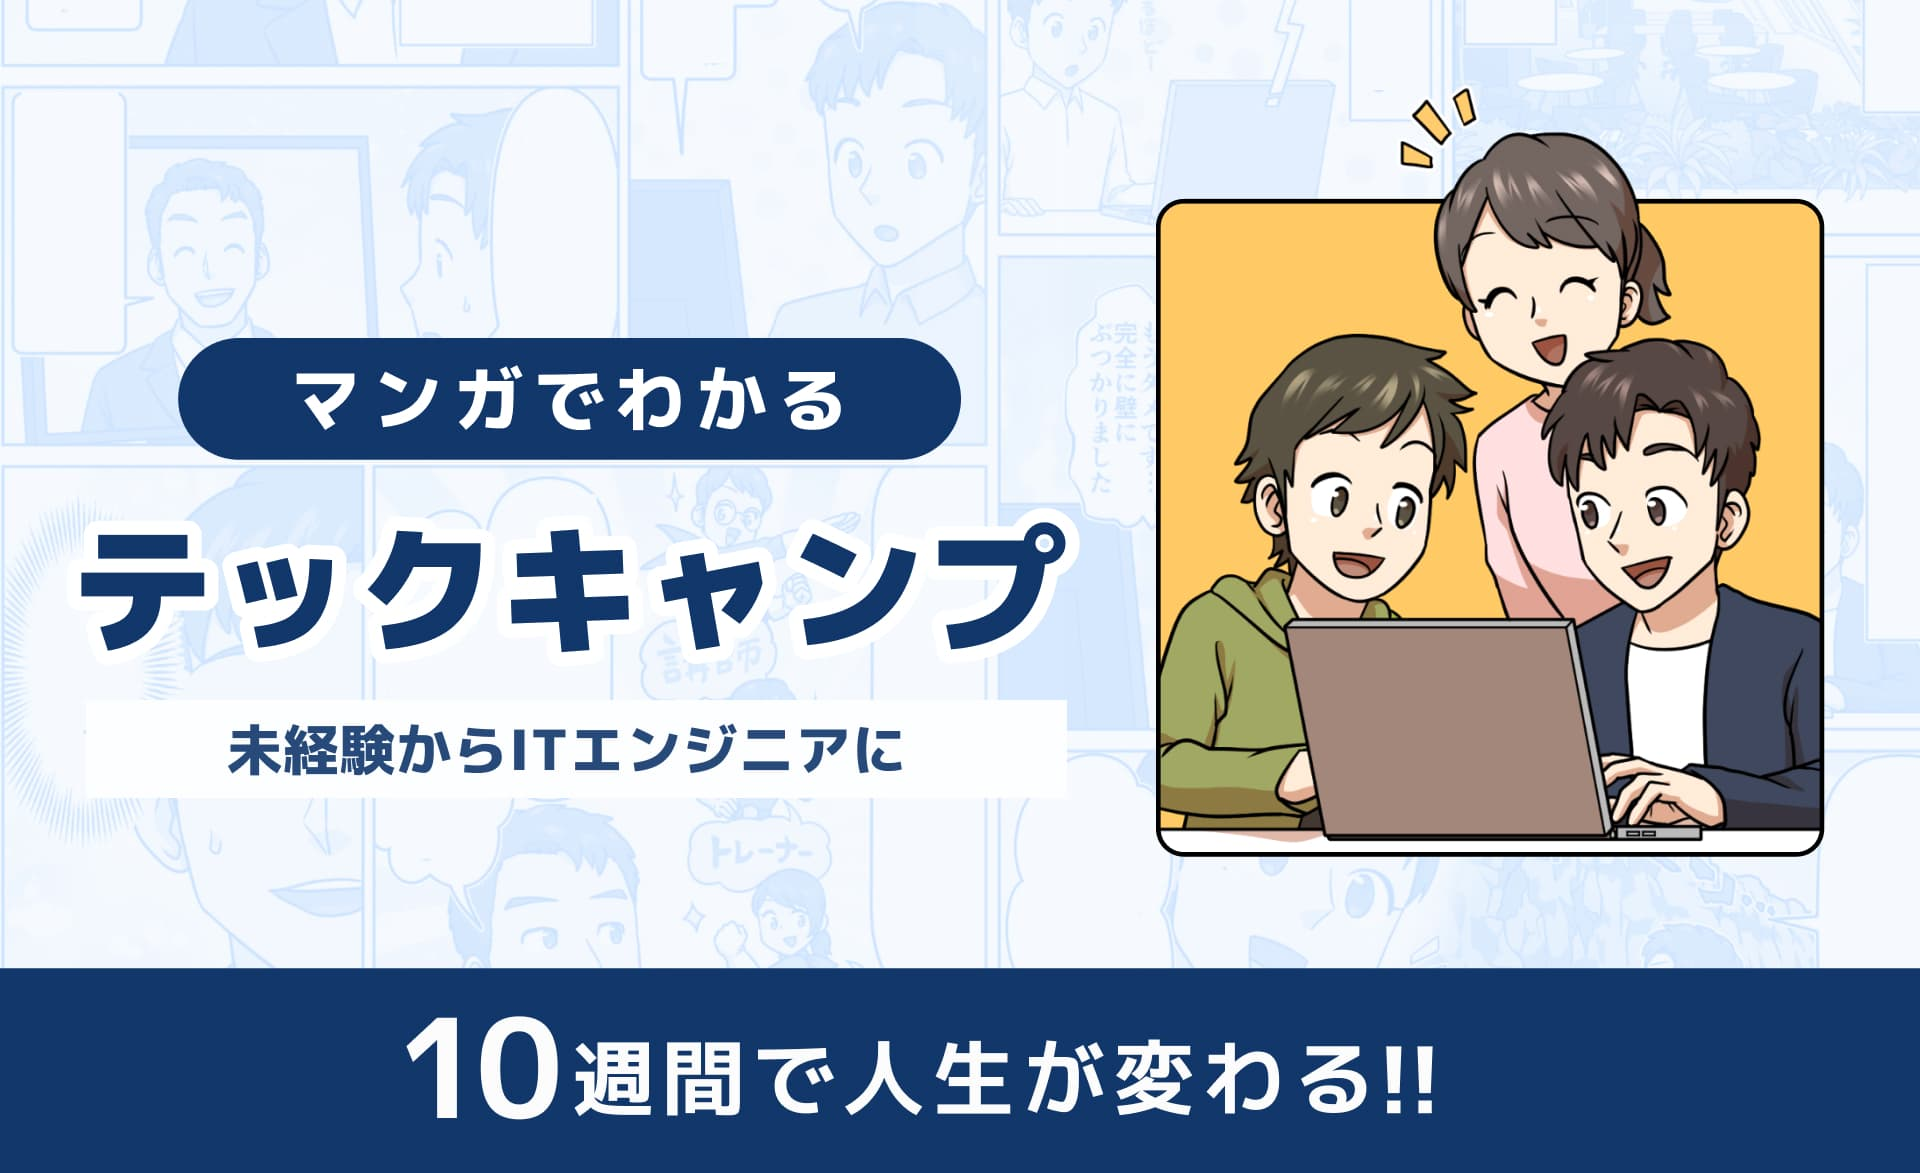 Ebook about exp manga